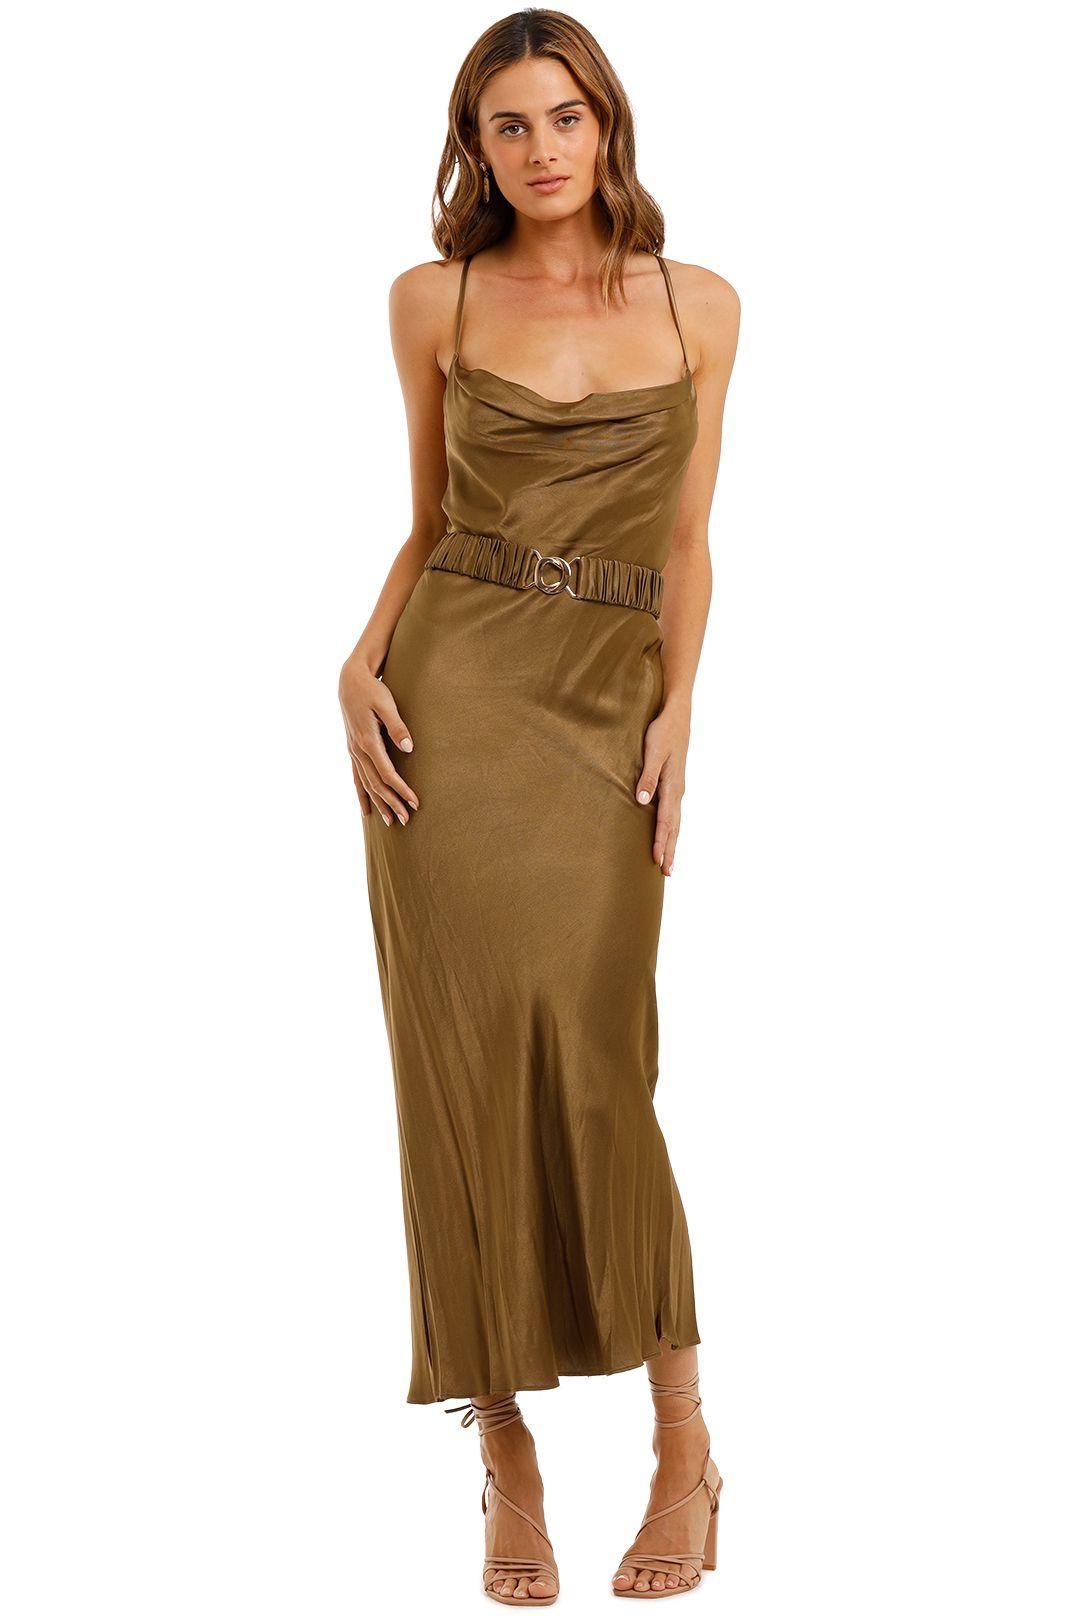 Shona Joy Gala Bias Midi Dress Olive Cowl Neck